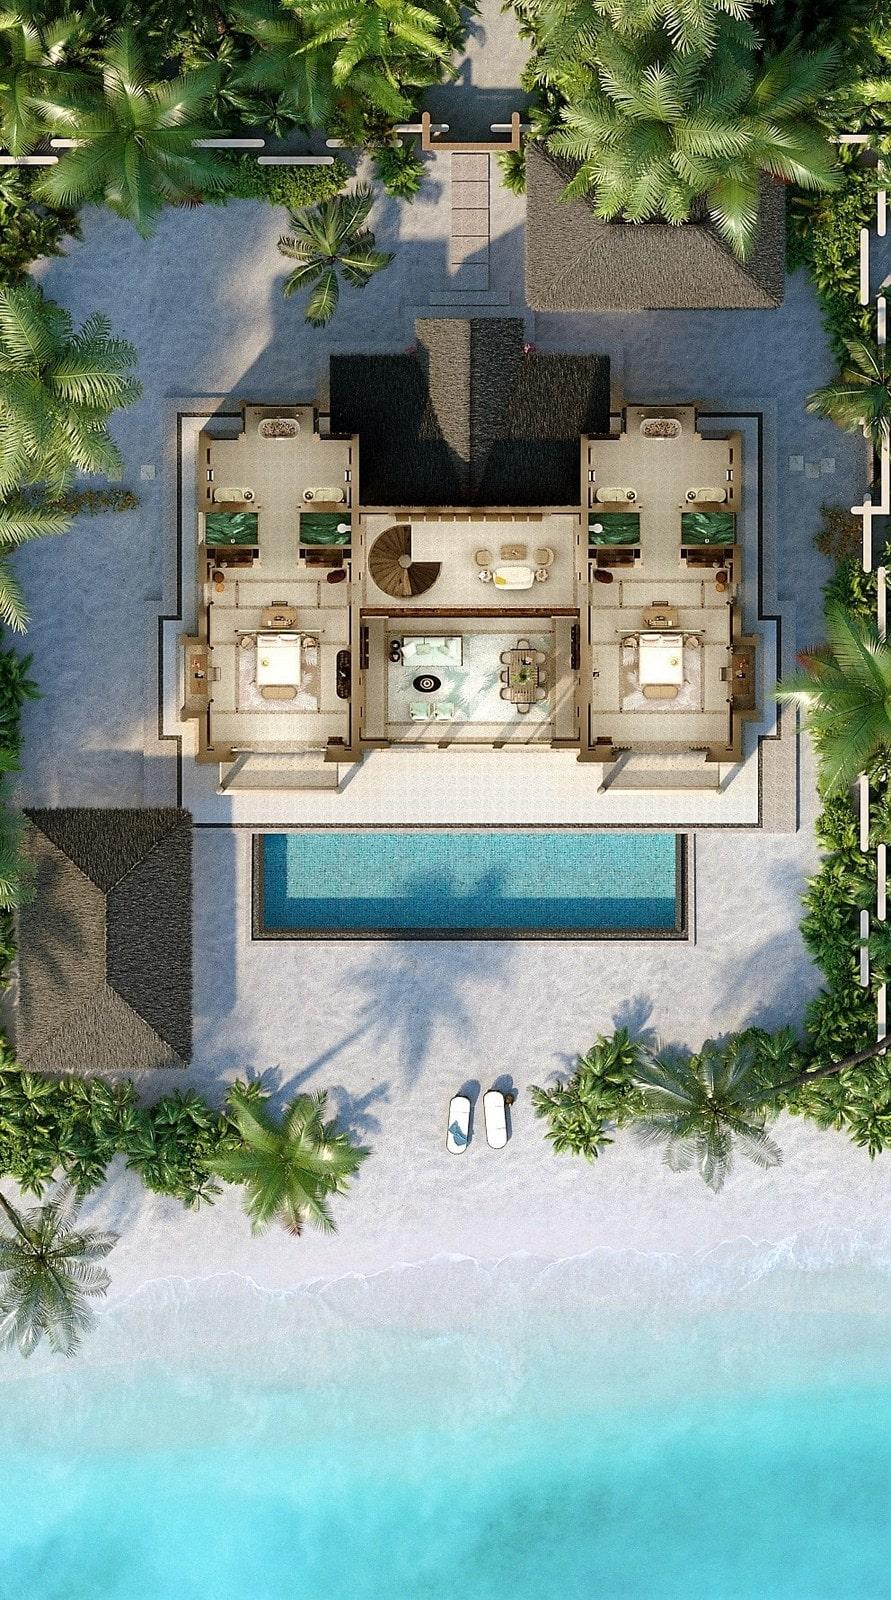 Мальдивы, отель Joali Maldives, план-схема номера Four Bed Room Beach Residence with Pool